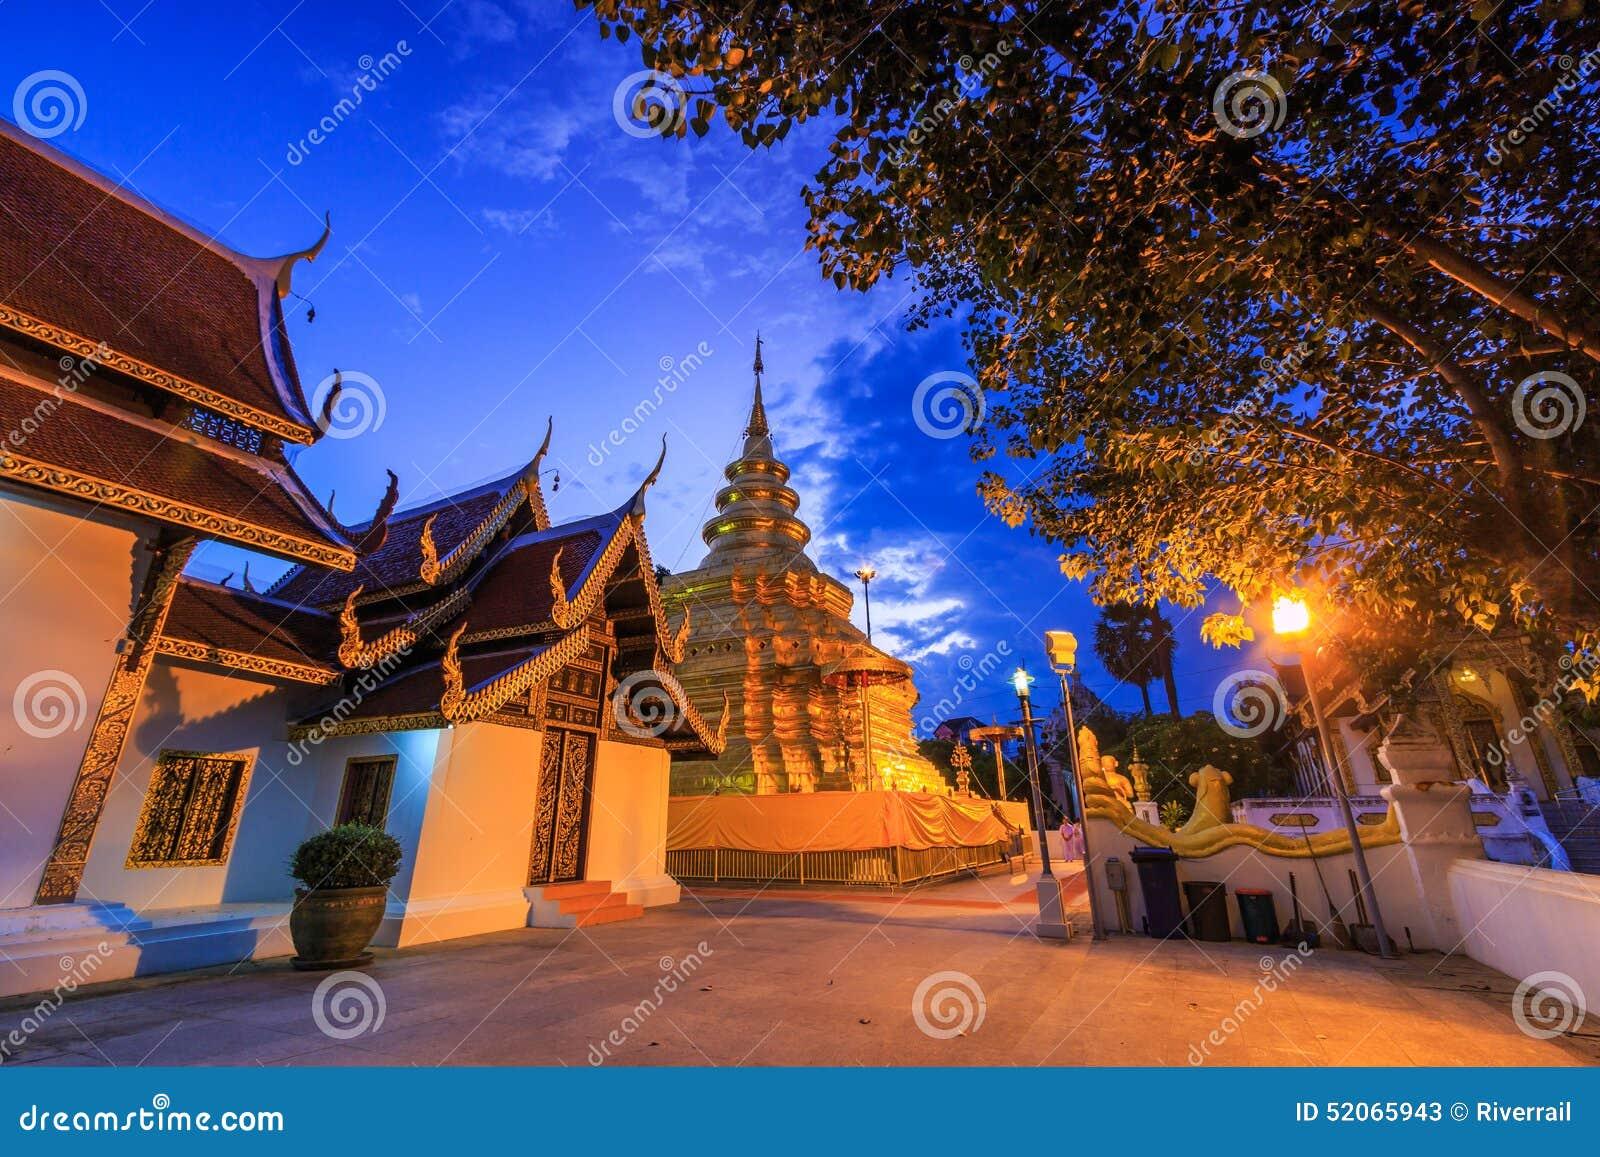 Wat Phra Dhatu Sri Chomtong Or Phra That Chom Thong Stock ...